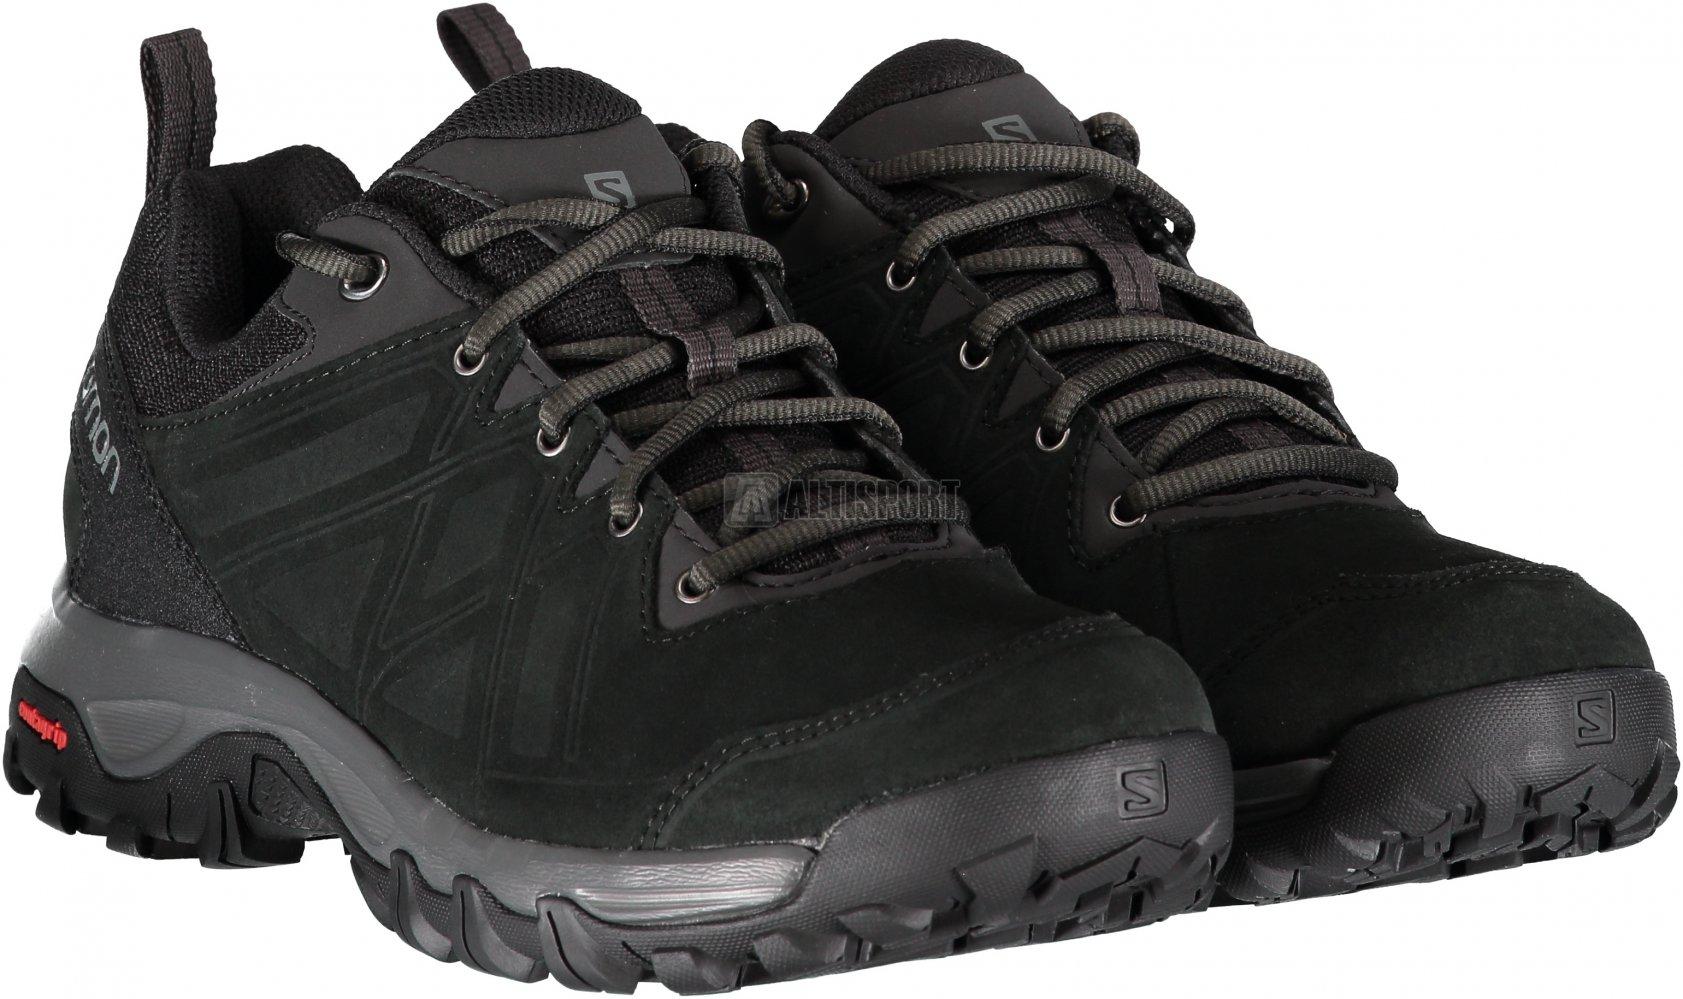 Pánské trekové boty SALOMON EVASION 2 LTR BLACK BLACK QUIET SHADE ... 0466f81856